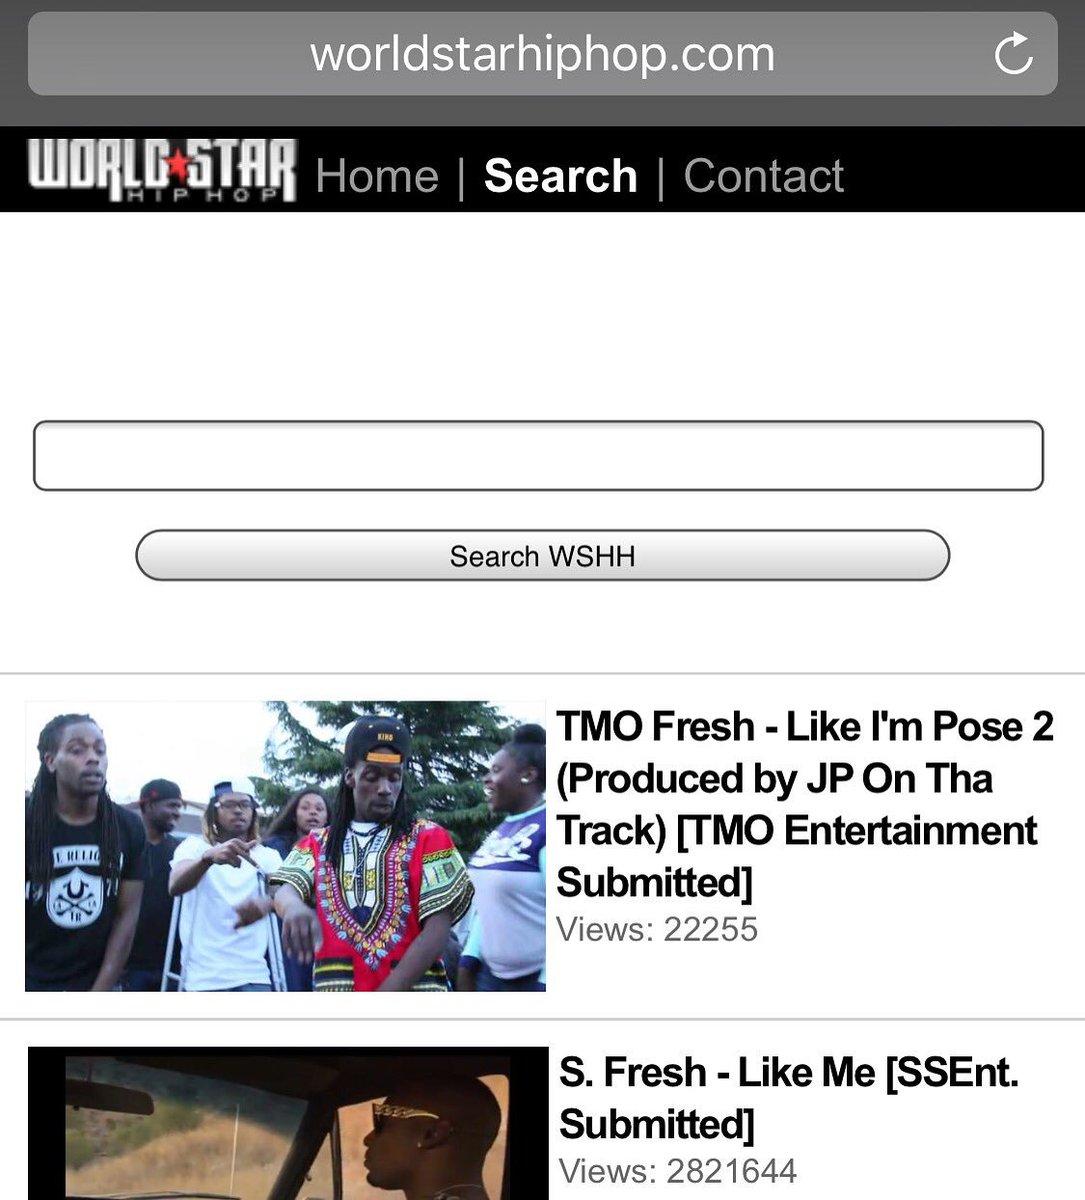 Tmofresh M Worldstarhiphop Com Apple Video Phpvwshh9pq4rltydu0e2xsb Worldstarhihop Thinkingmoneyonlyent Tmo Fresh Official Video Like Im